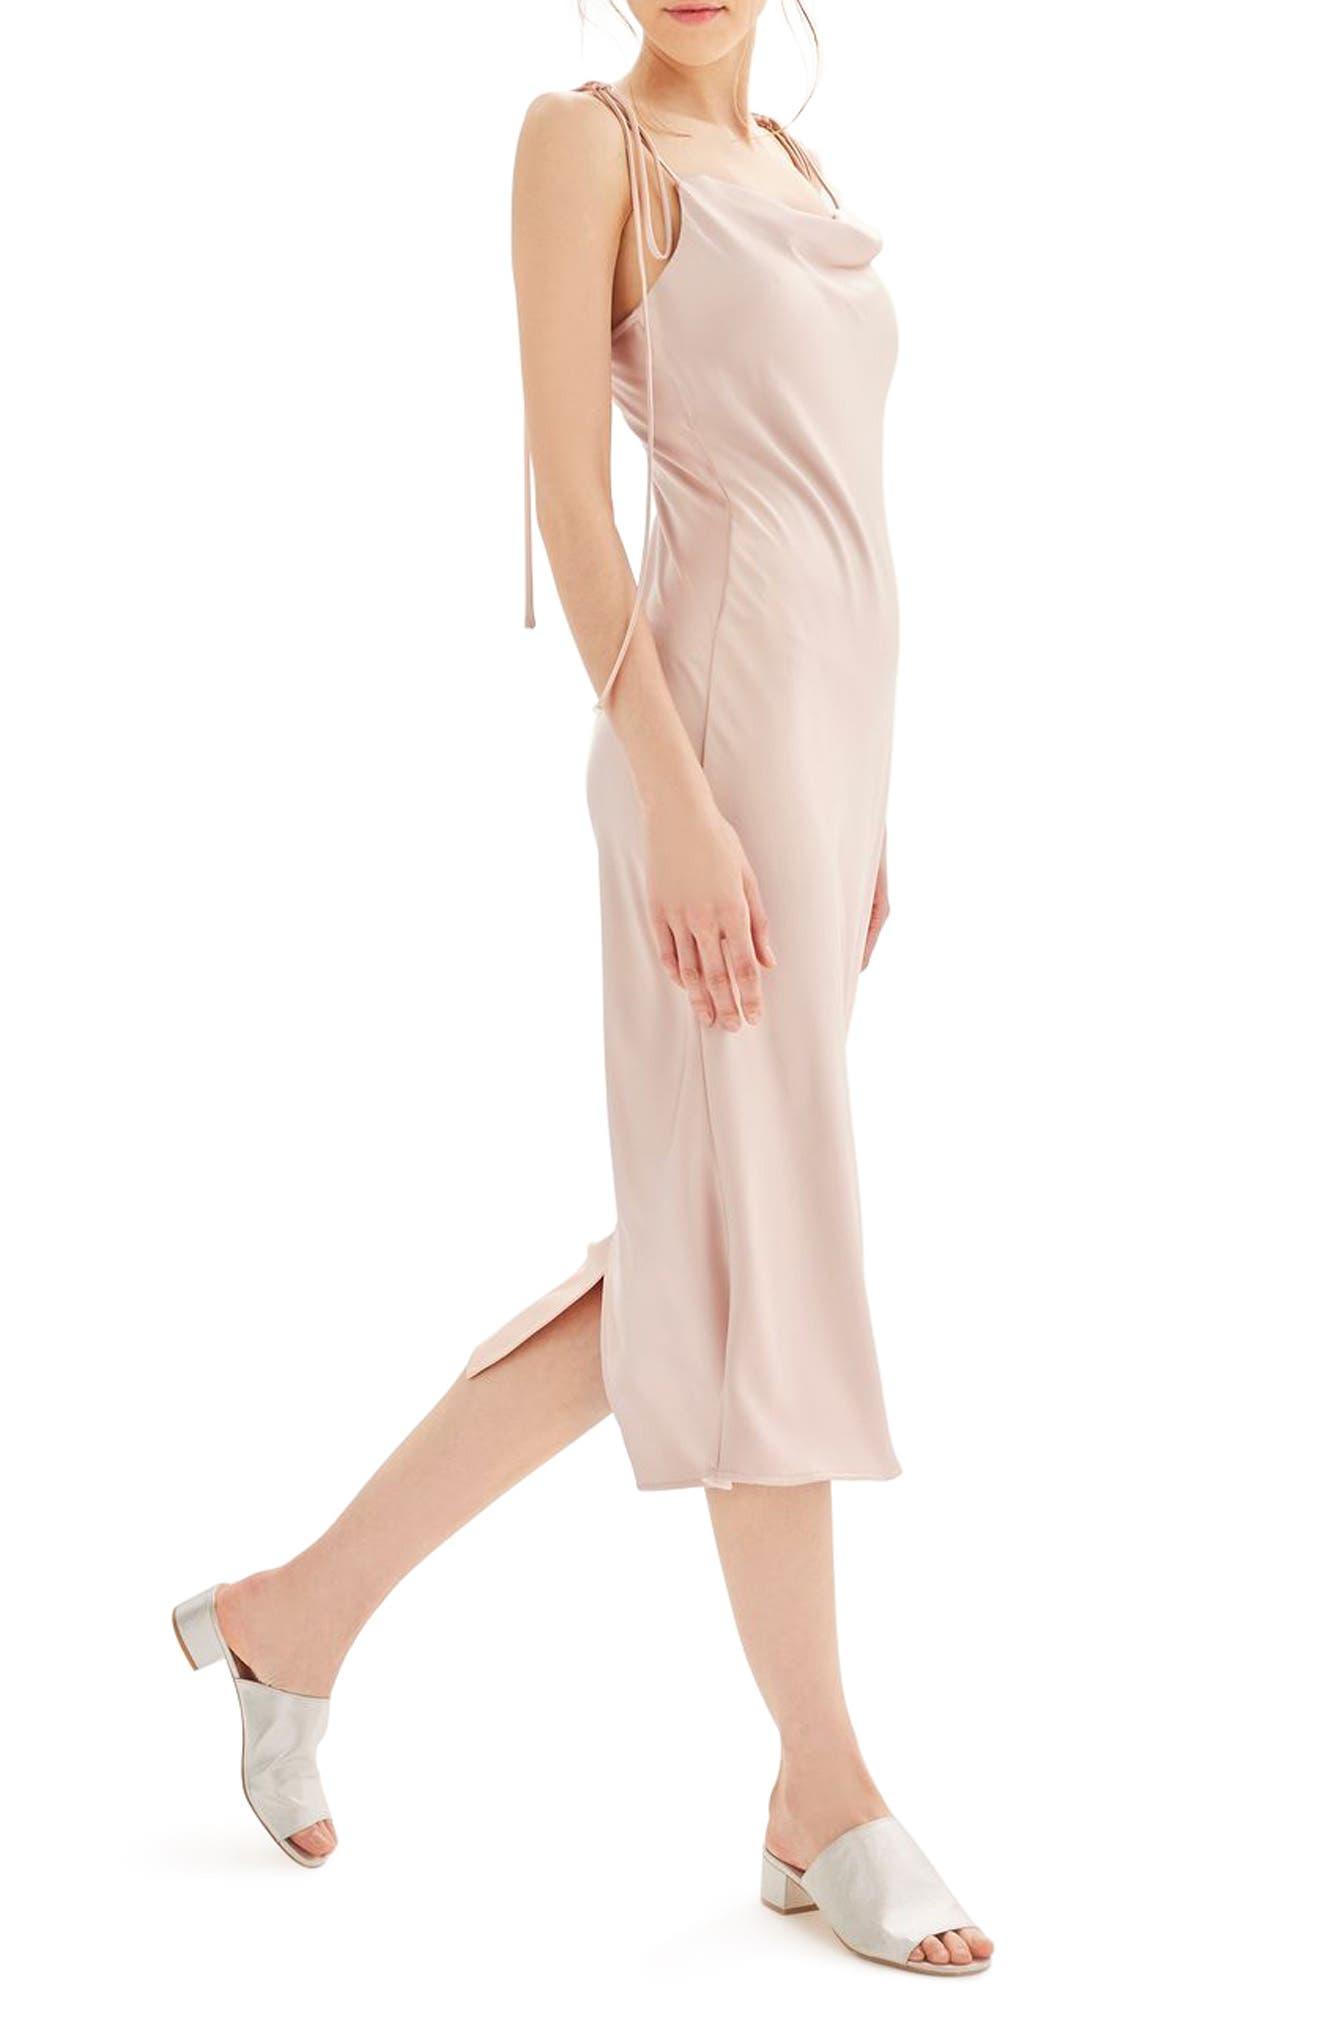 Alternate Image 1 Selected - Topshop Bride Cowl Neck Midi Dress